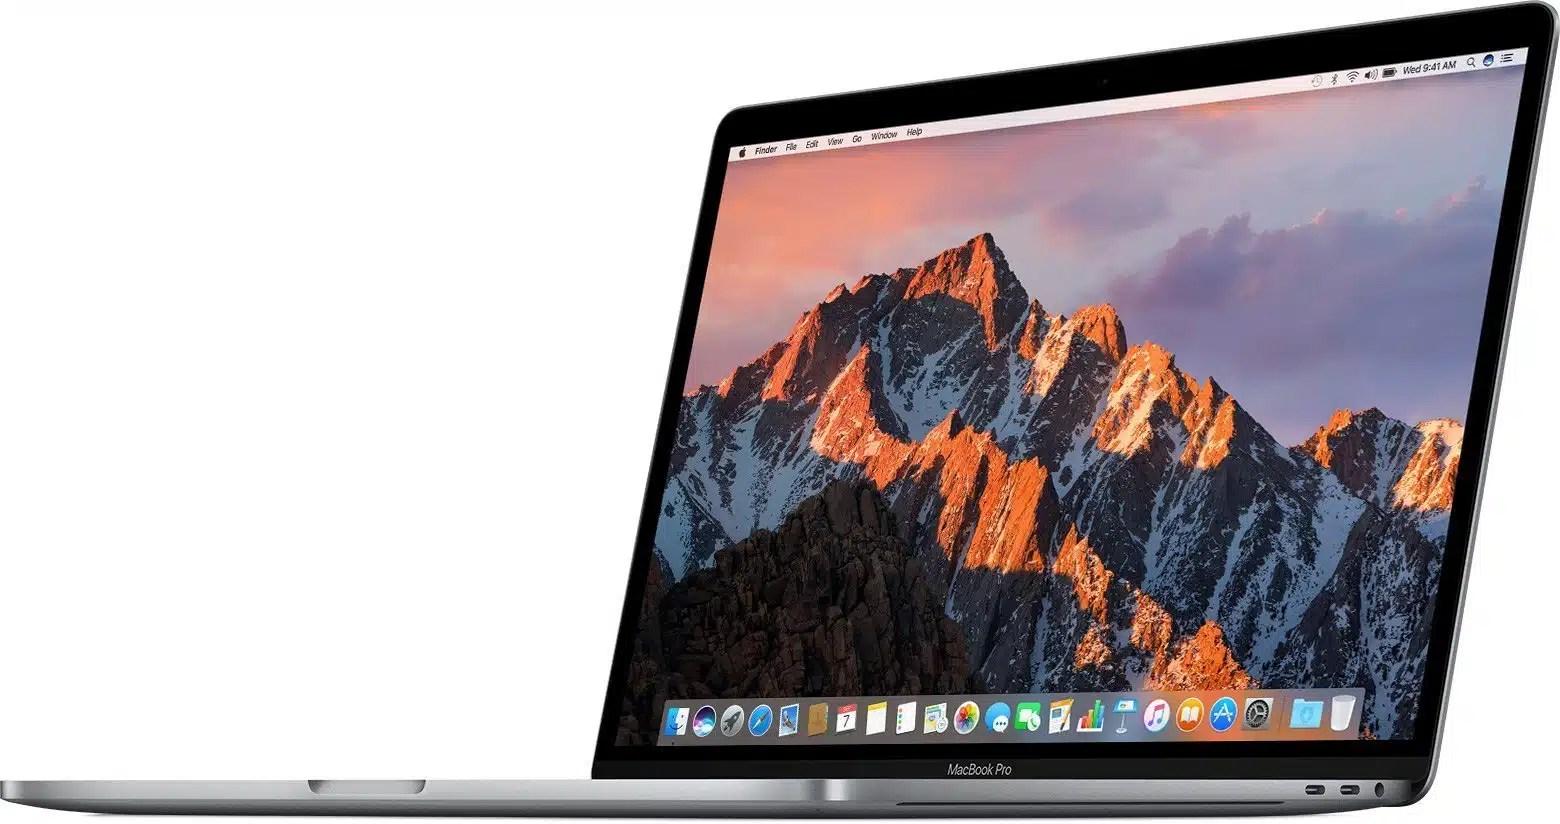 https://www.mycomputerworks.co.uk/apple-mac-repair-and-upgrades-horsham/